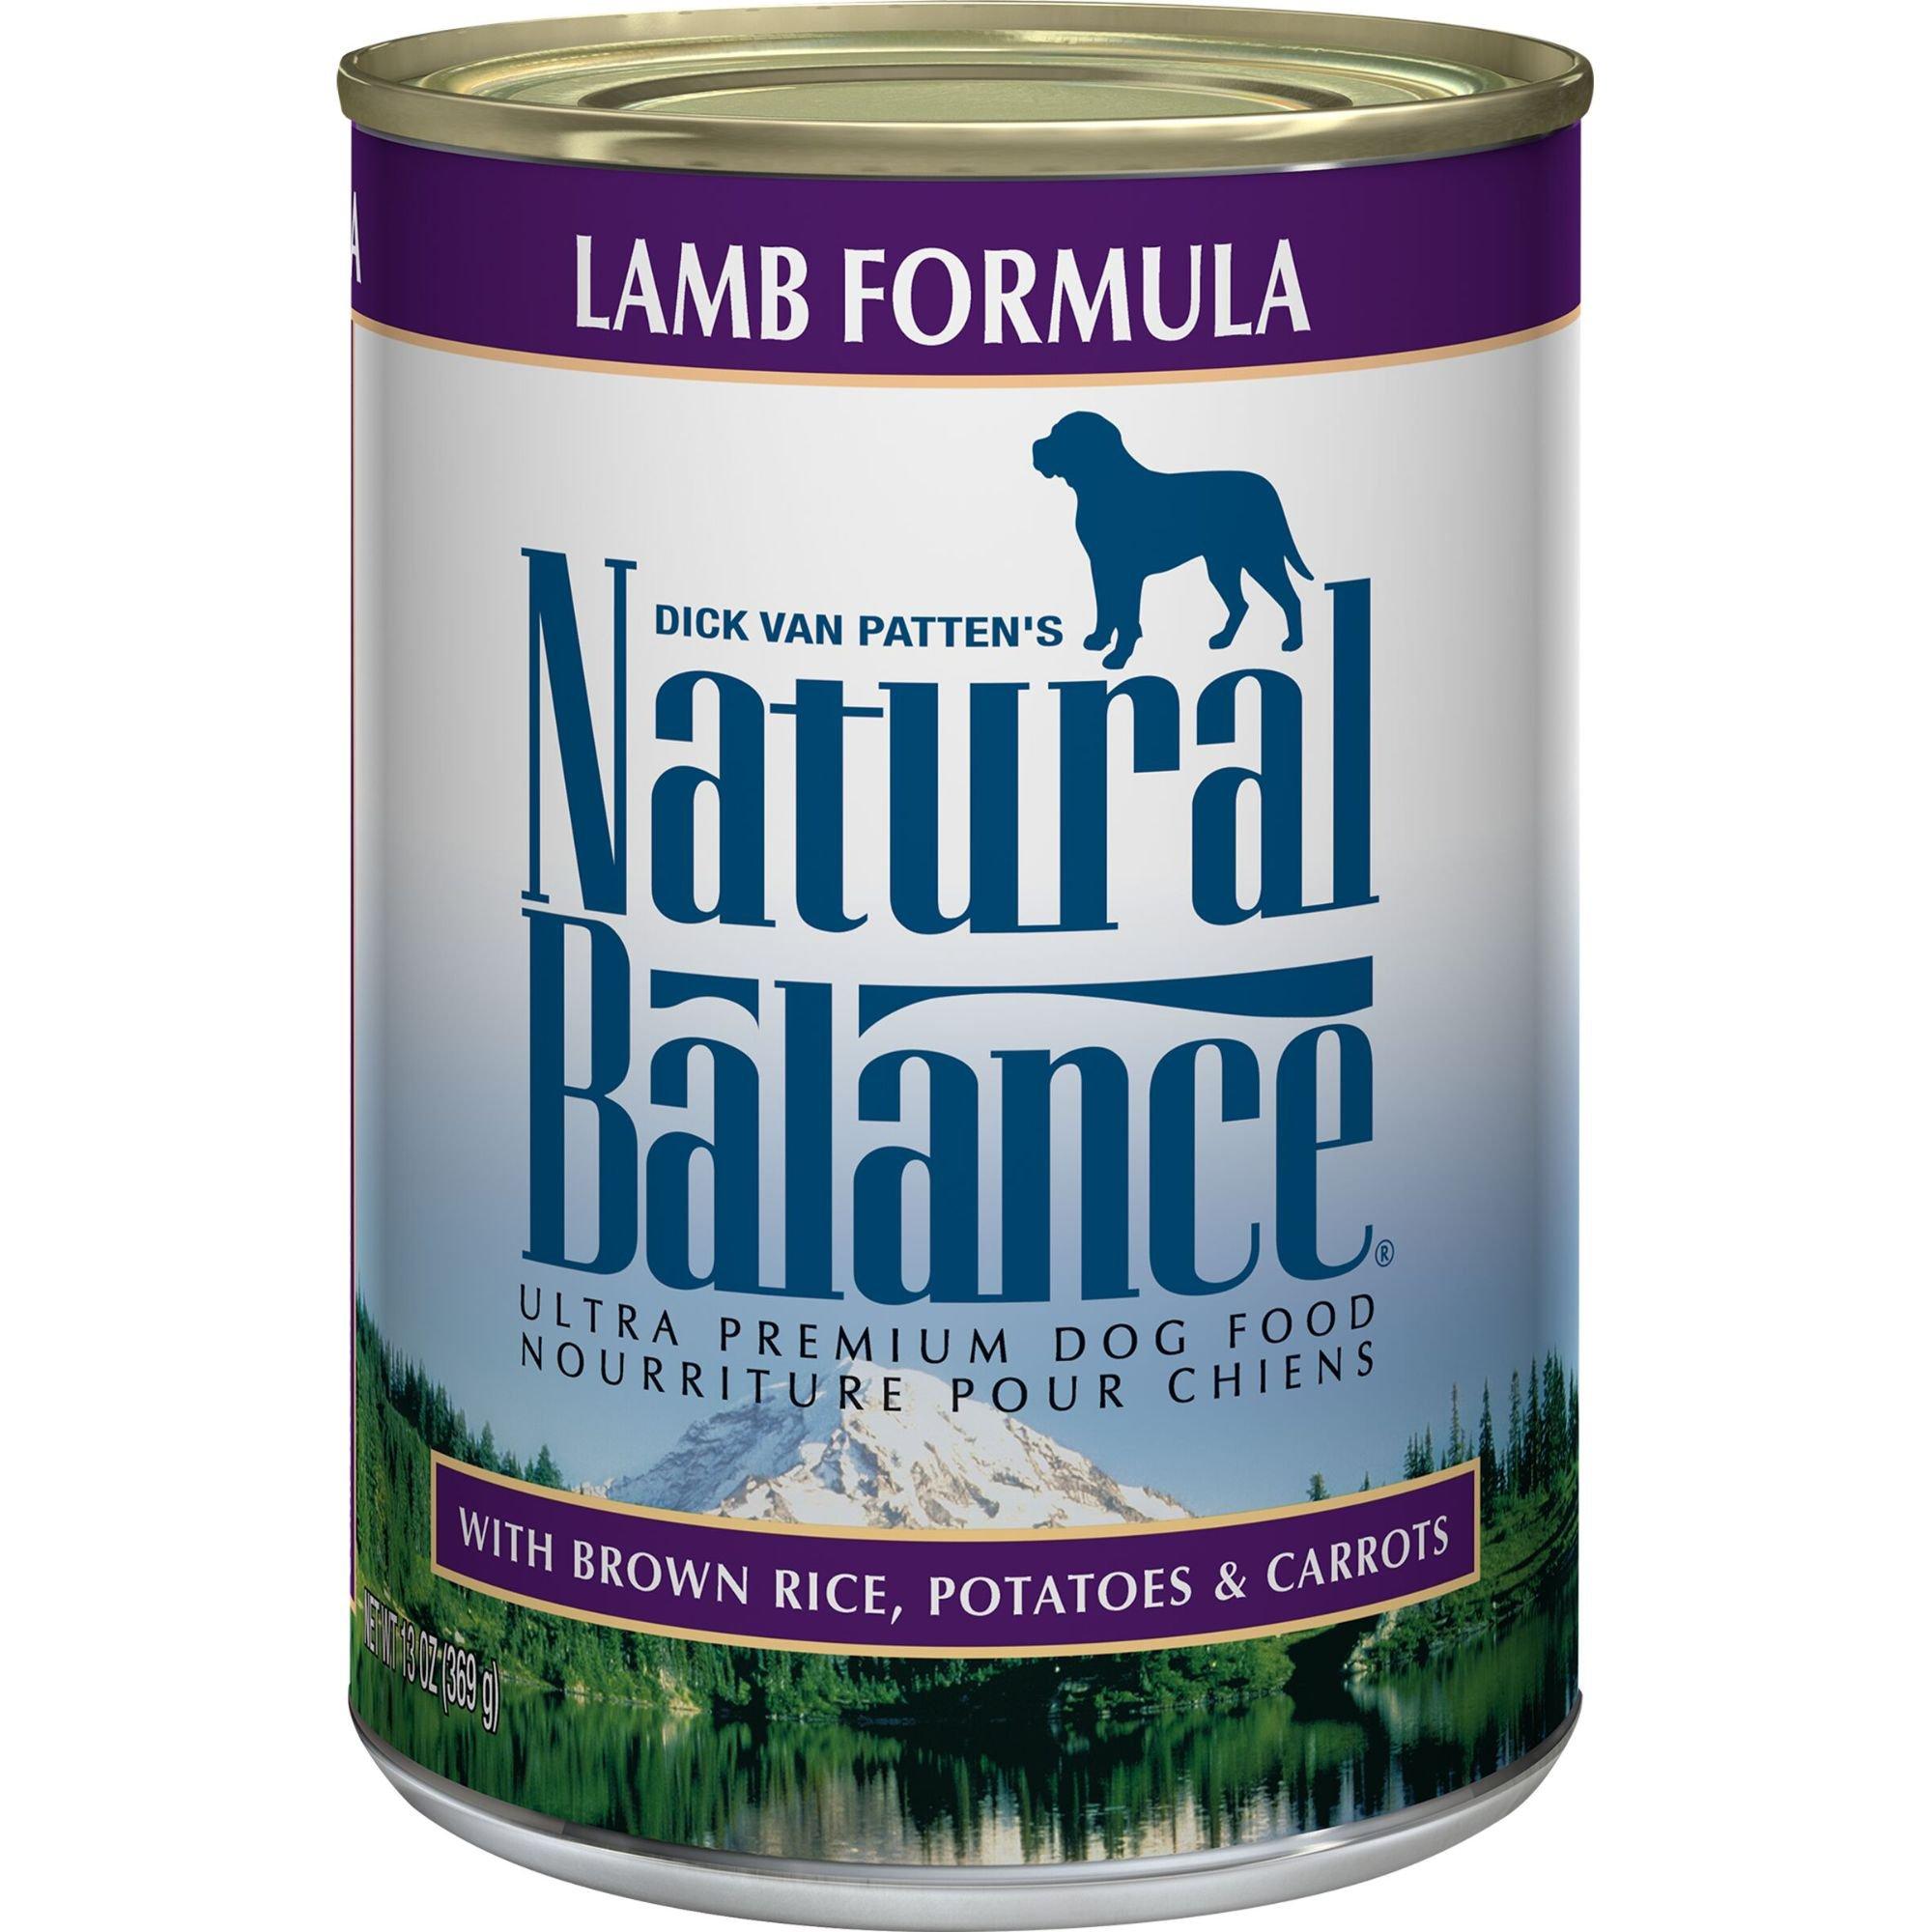 Natural Balance Dog Food Price Comparison